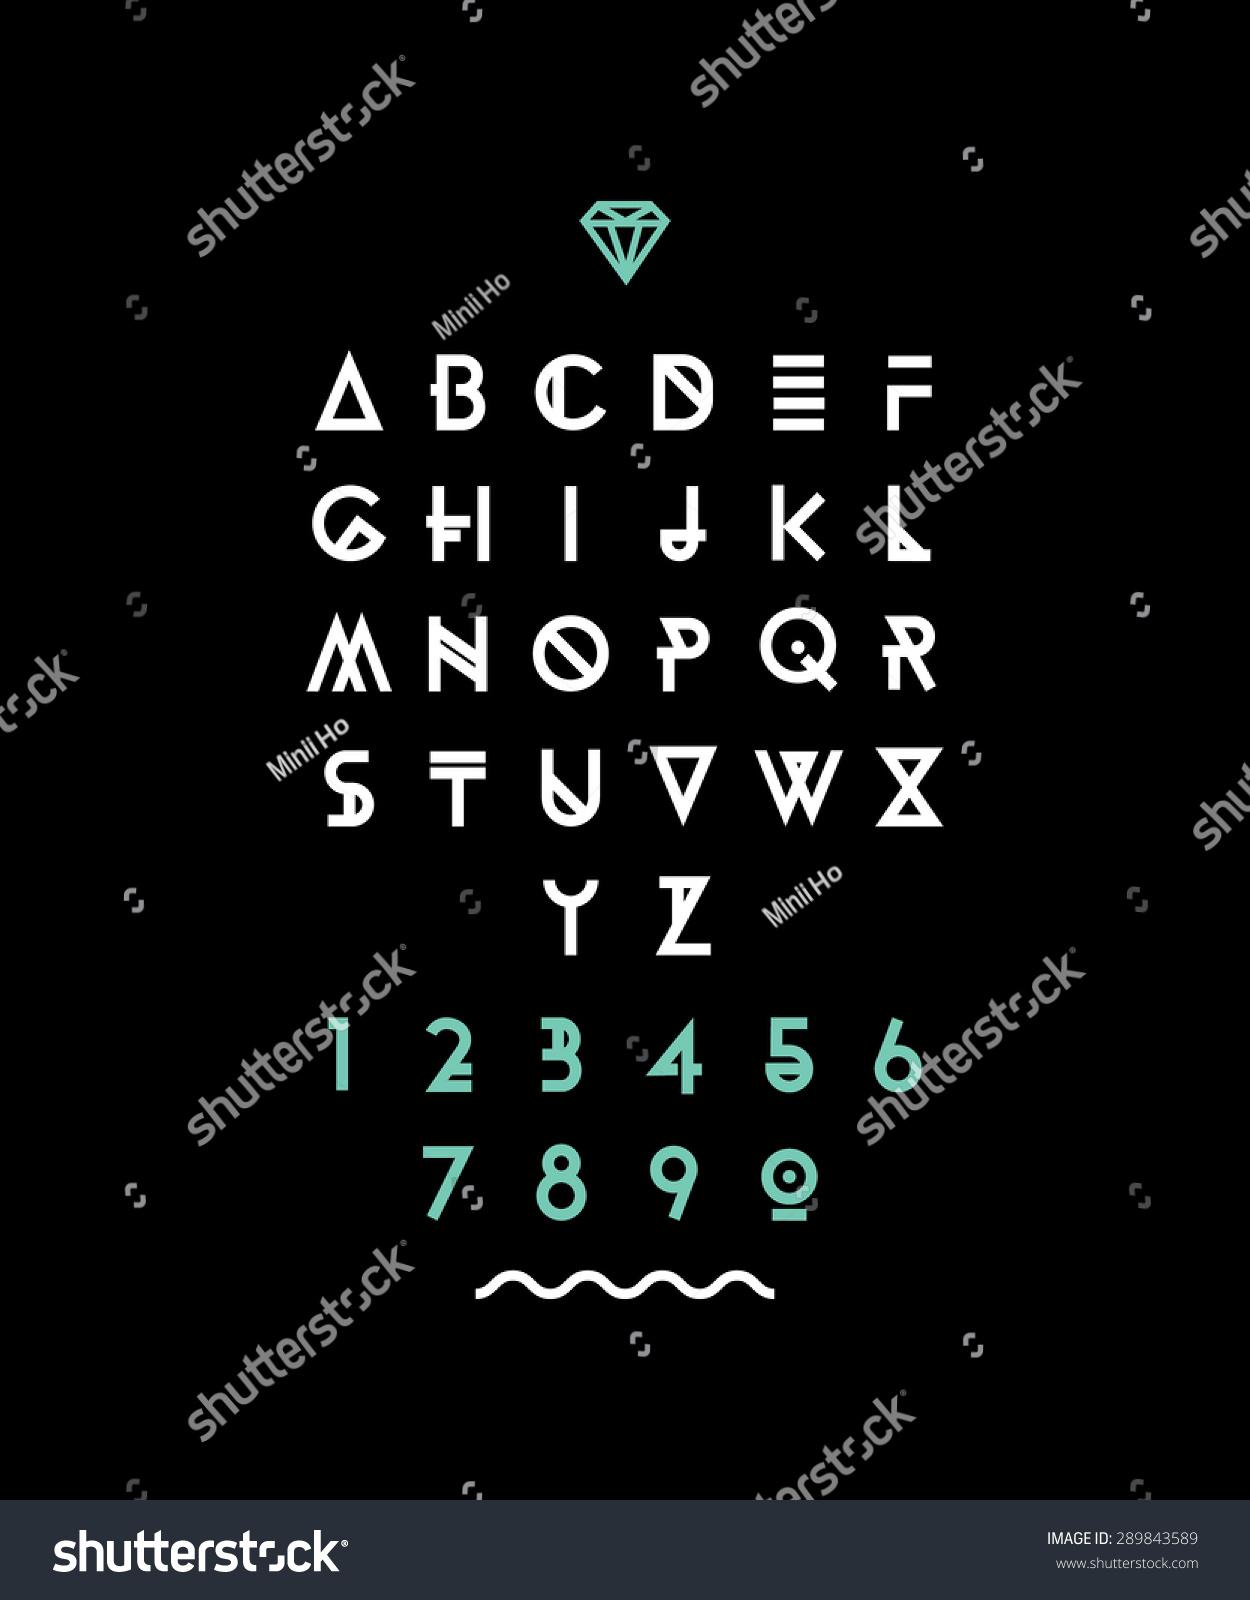 Hipster Font Typeface Typography Typewriter Poster Stock